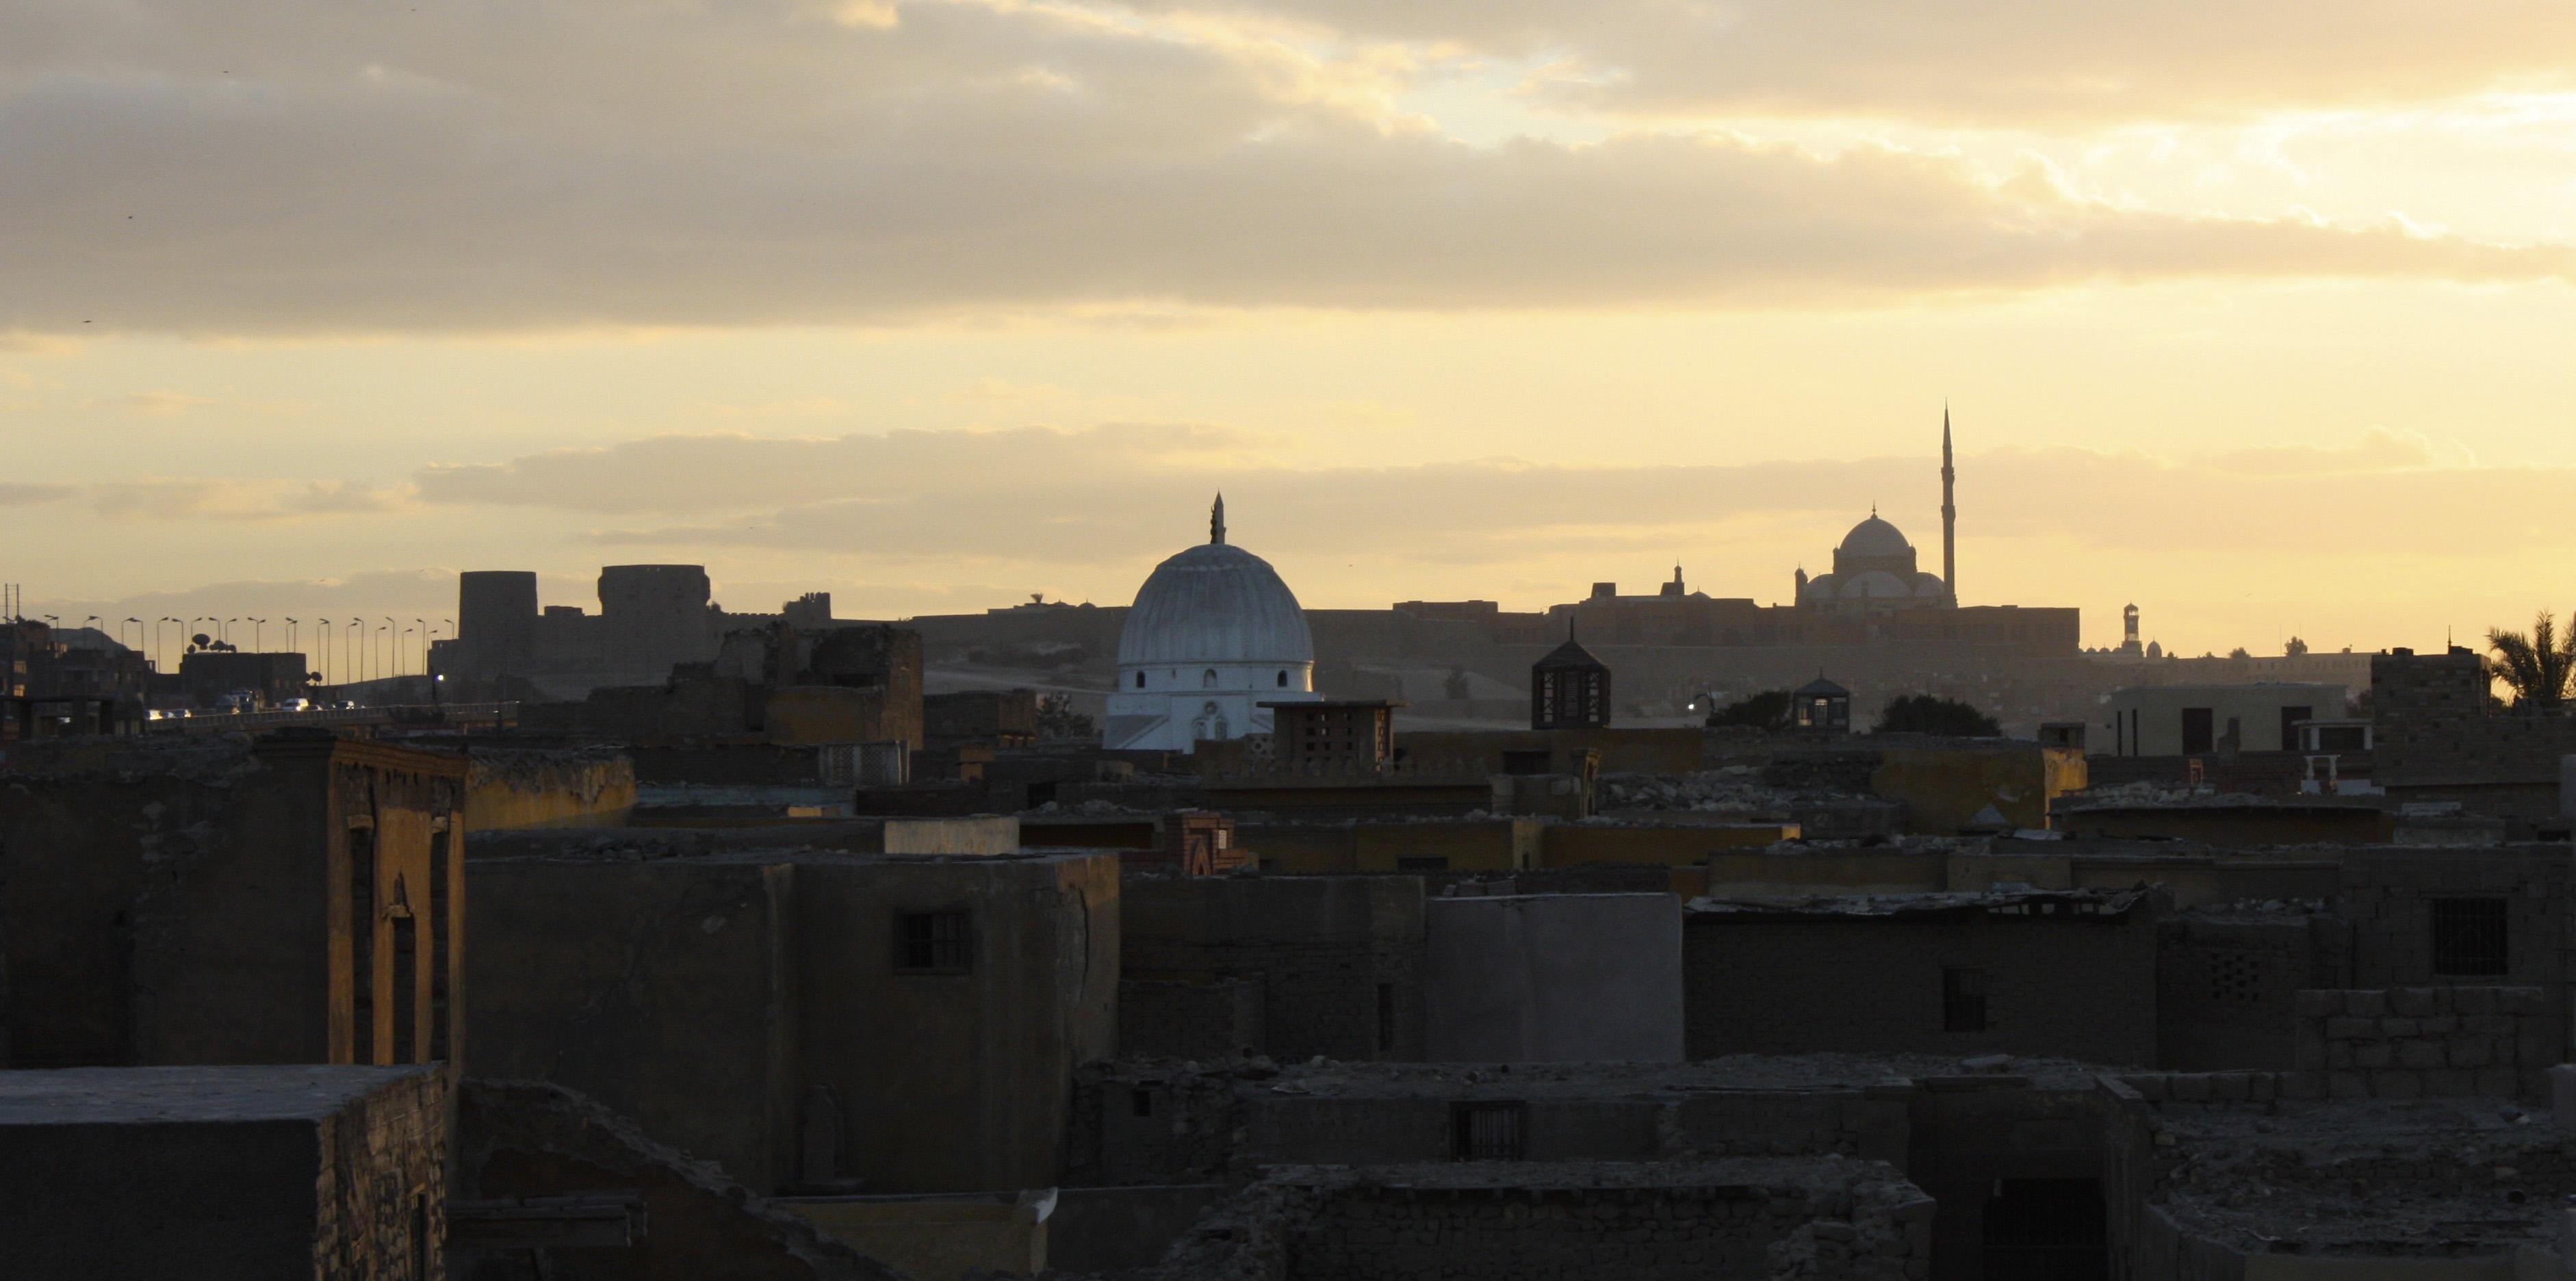 10_Dusk_over_the_Ruins_Cairo,_Egypt_2008